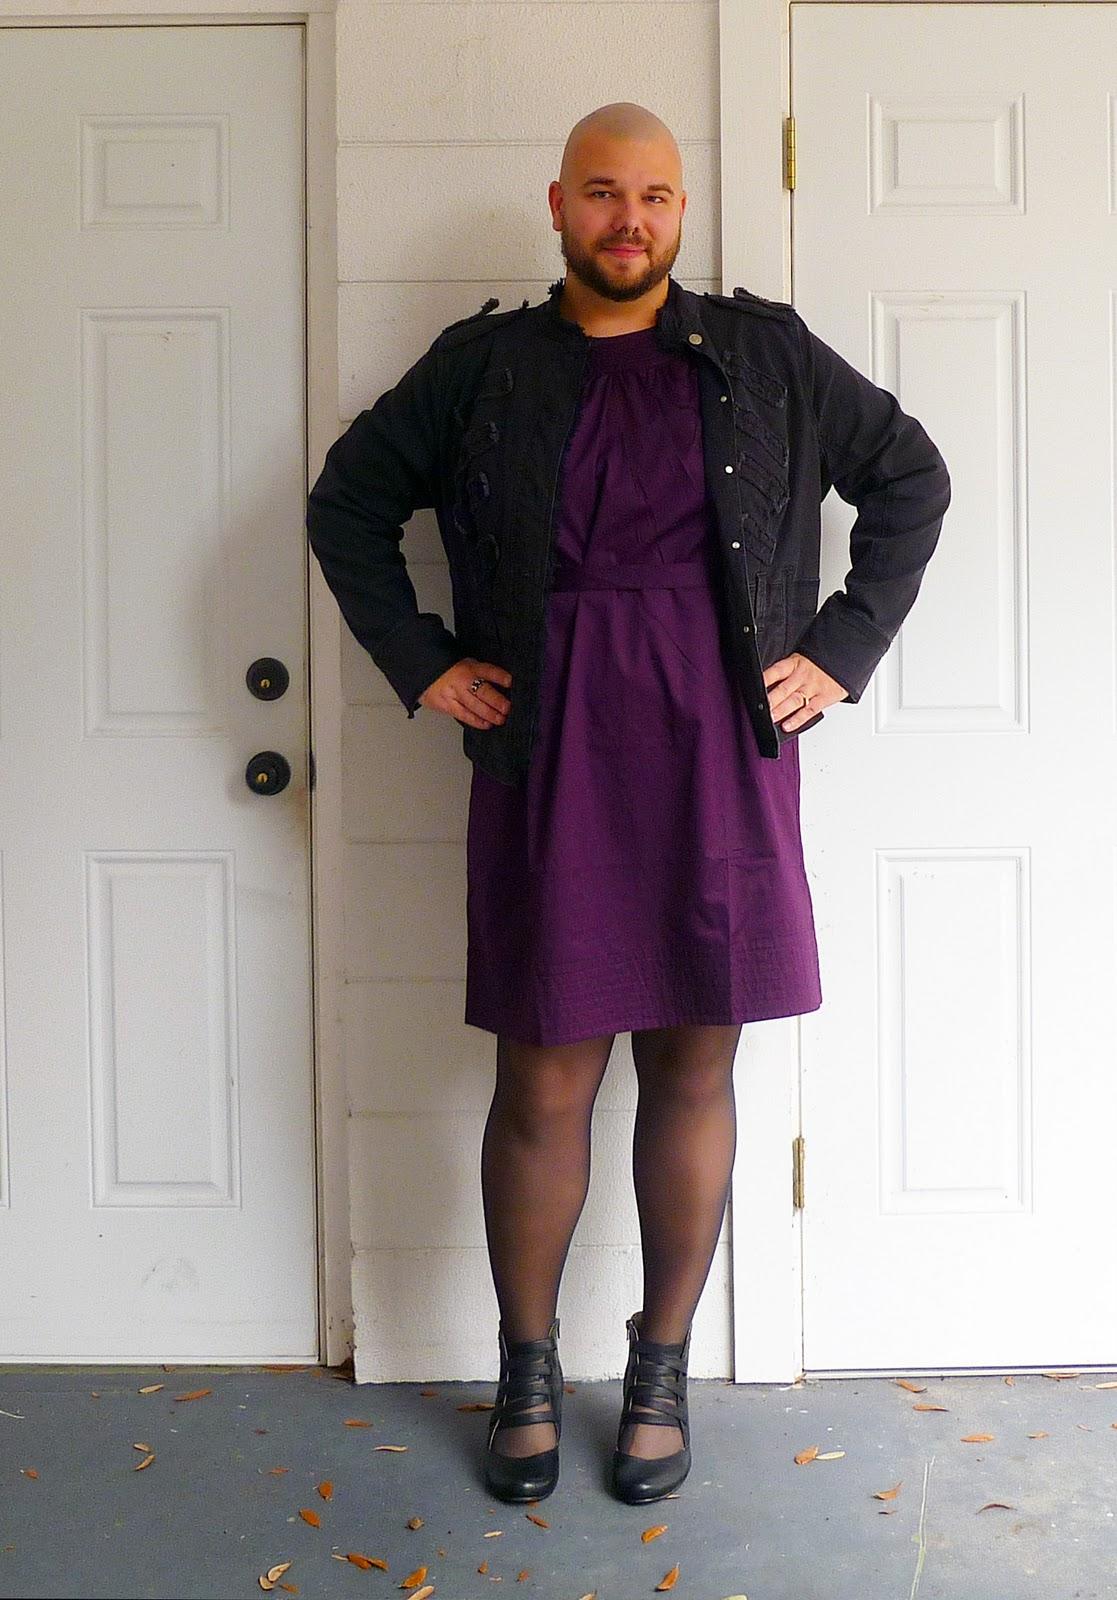 Elegant  FashionablewithLuxuryWinterOutfitsforMensandWomenbyBurberry